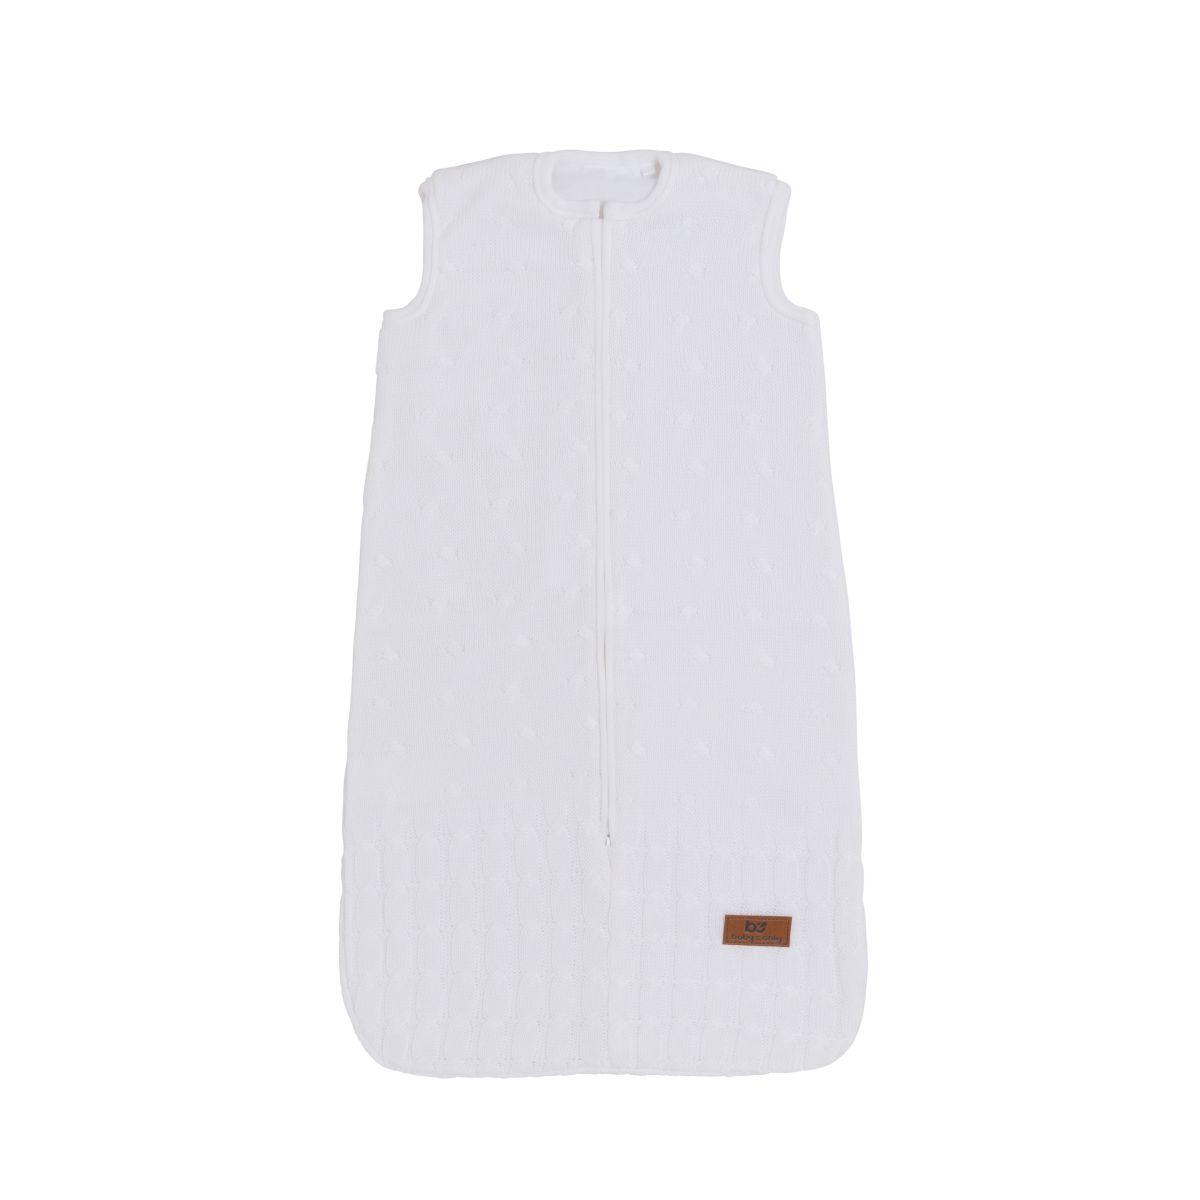 sleeping bag cable white 70 cm